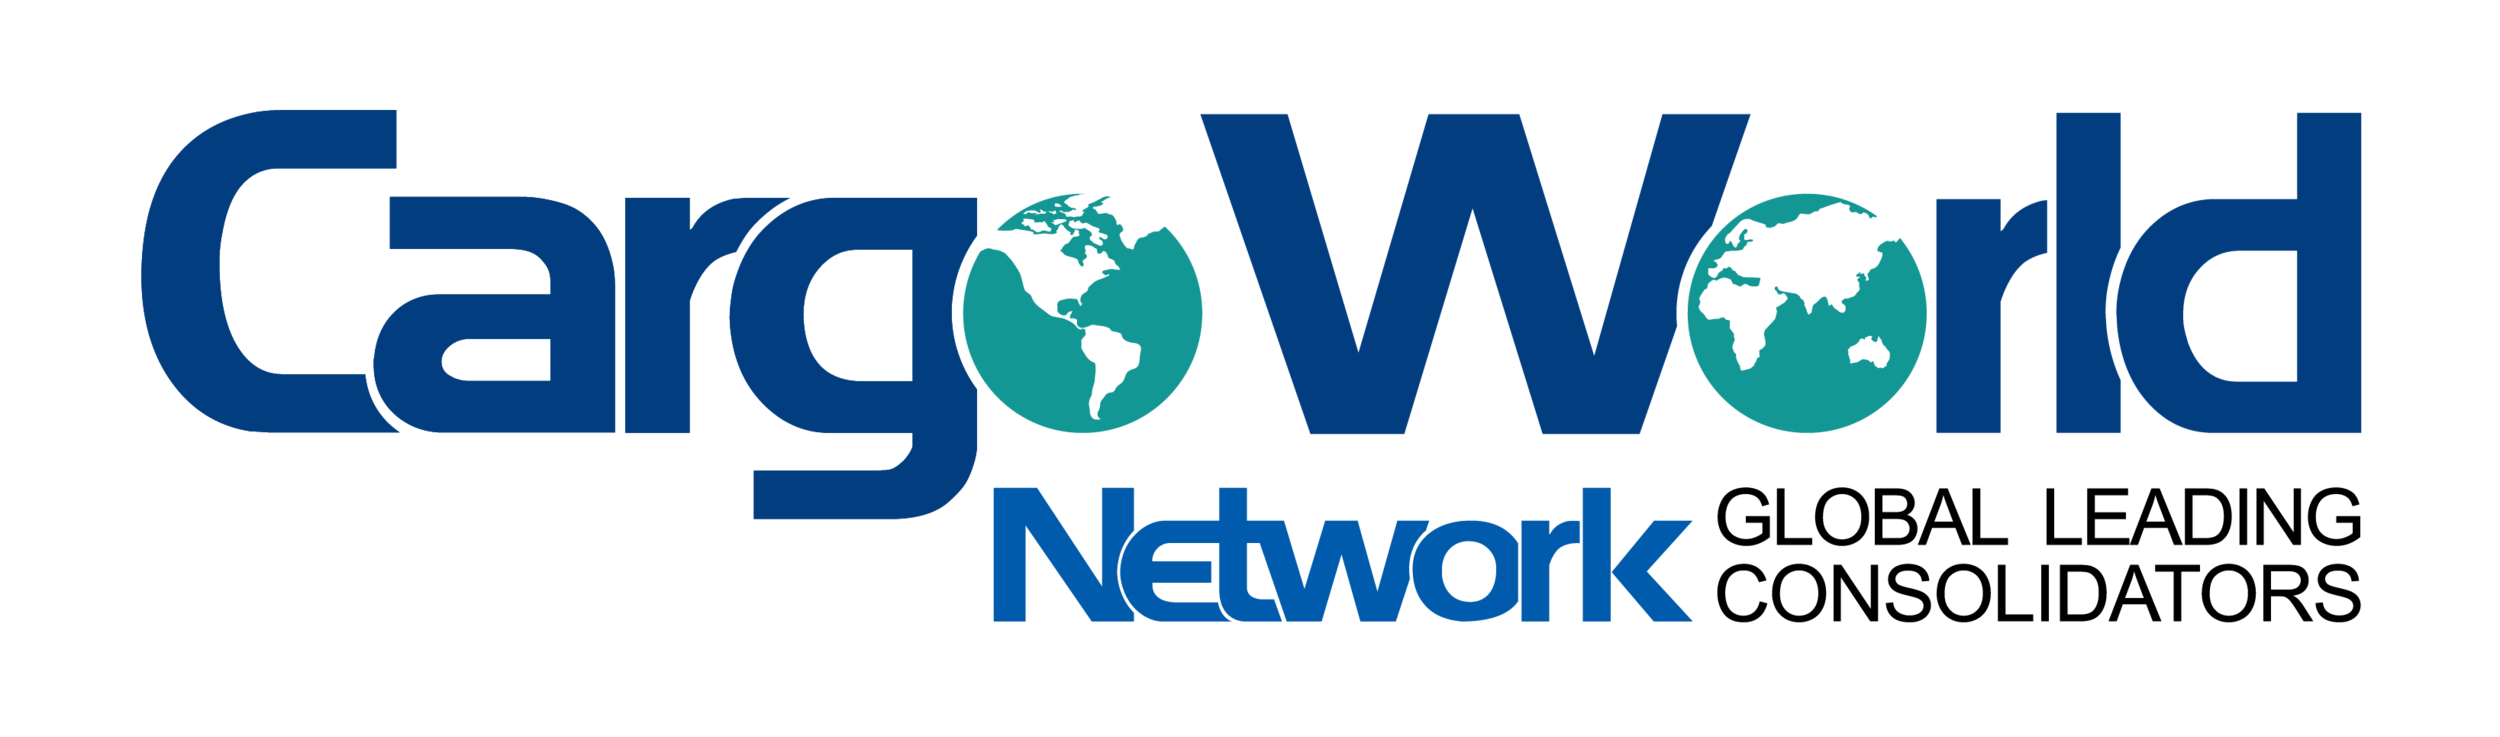 cargo-world-logo.png